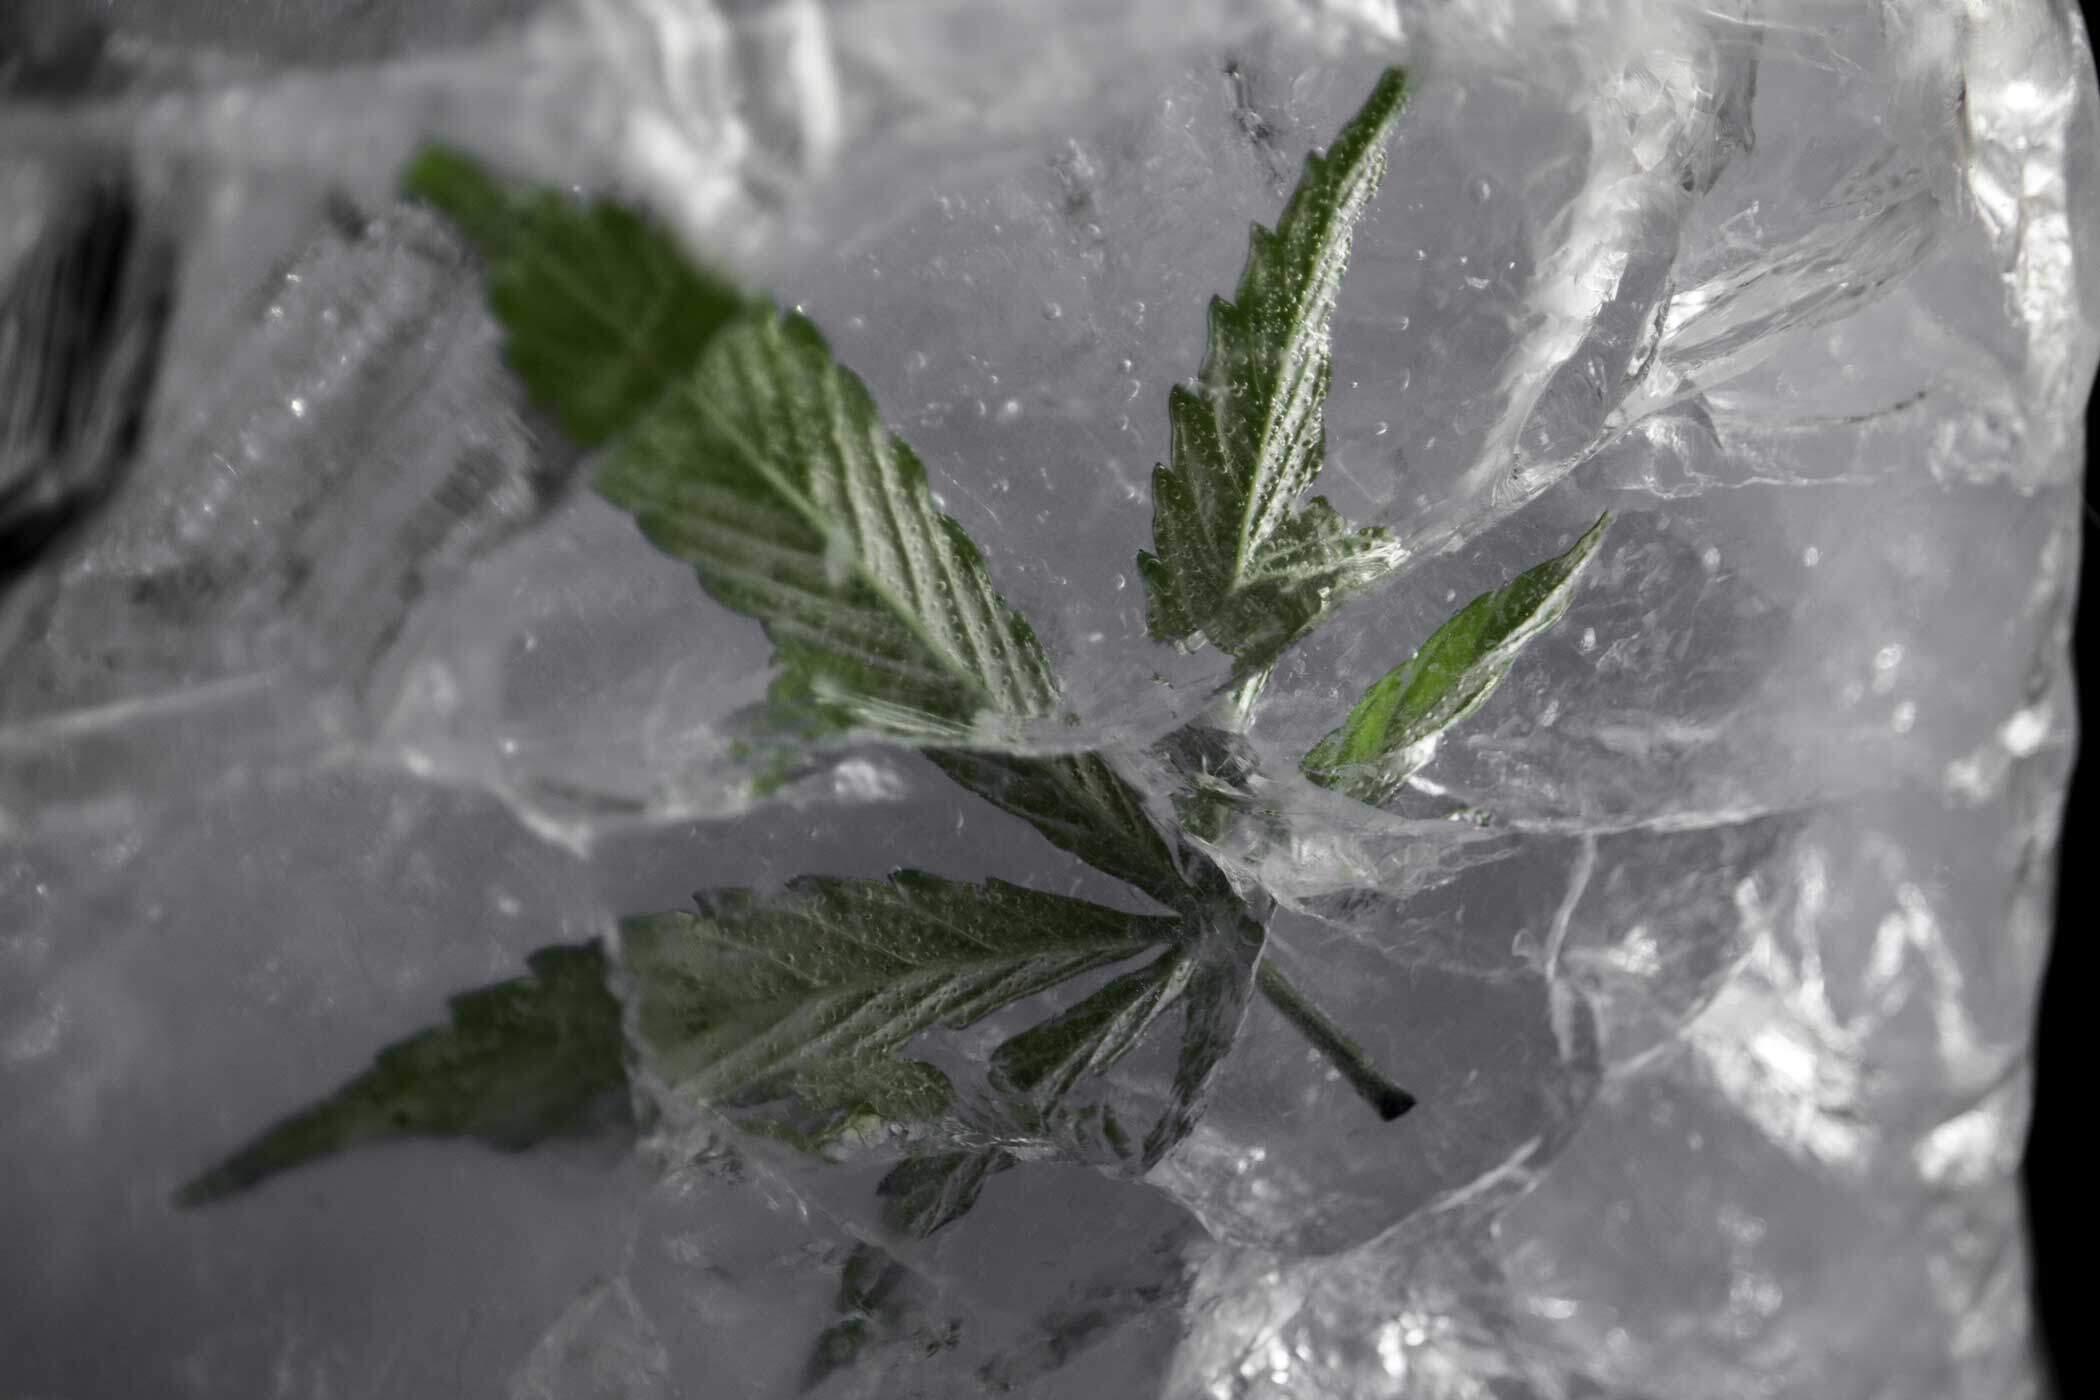 february-2021-photo-contest-hemp-leaf-in-ice-AdobeStock_387439398